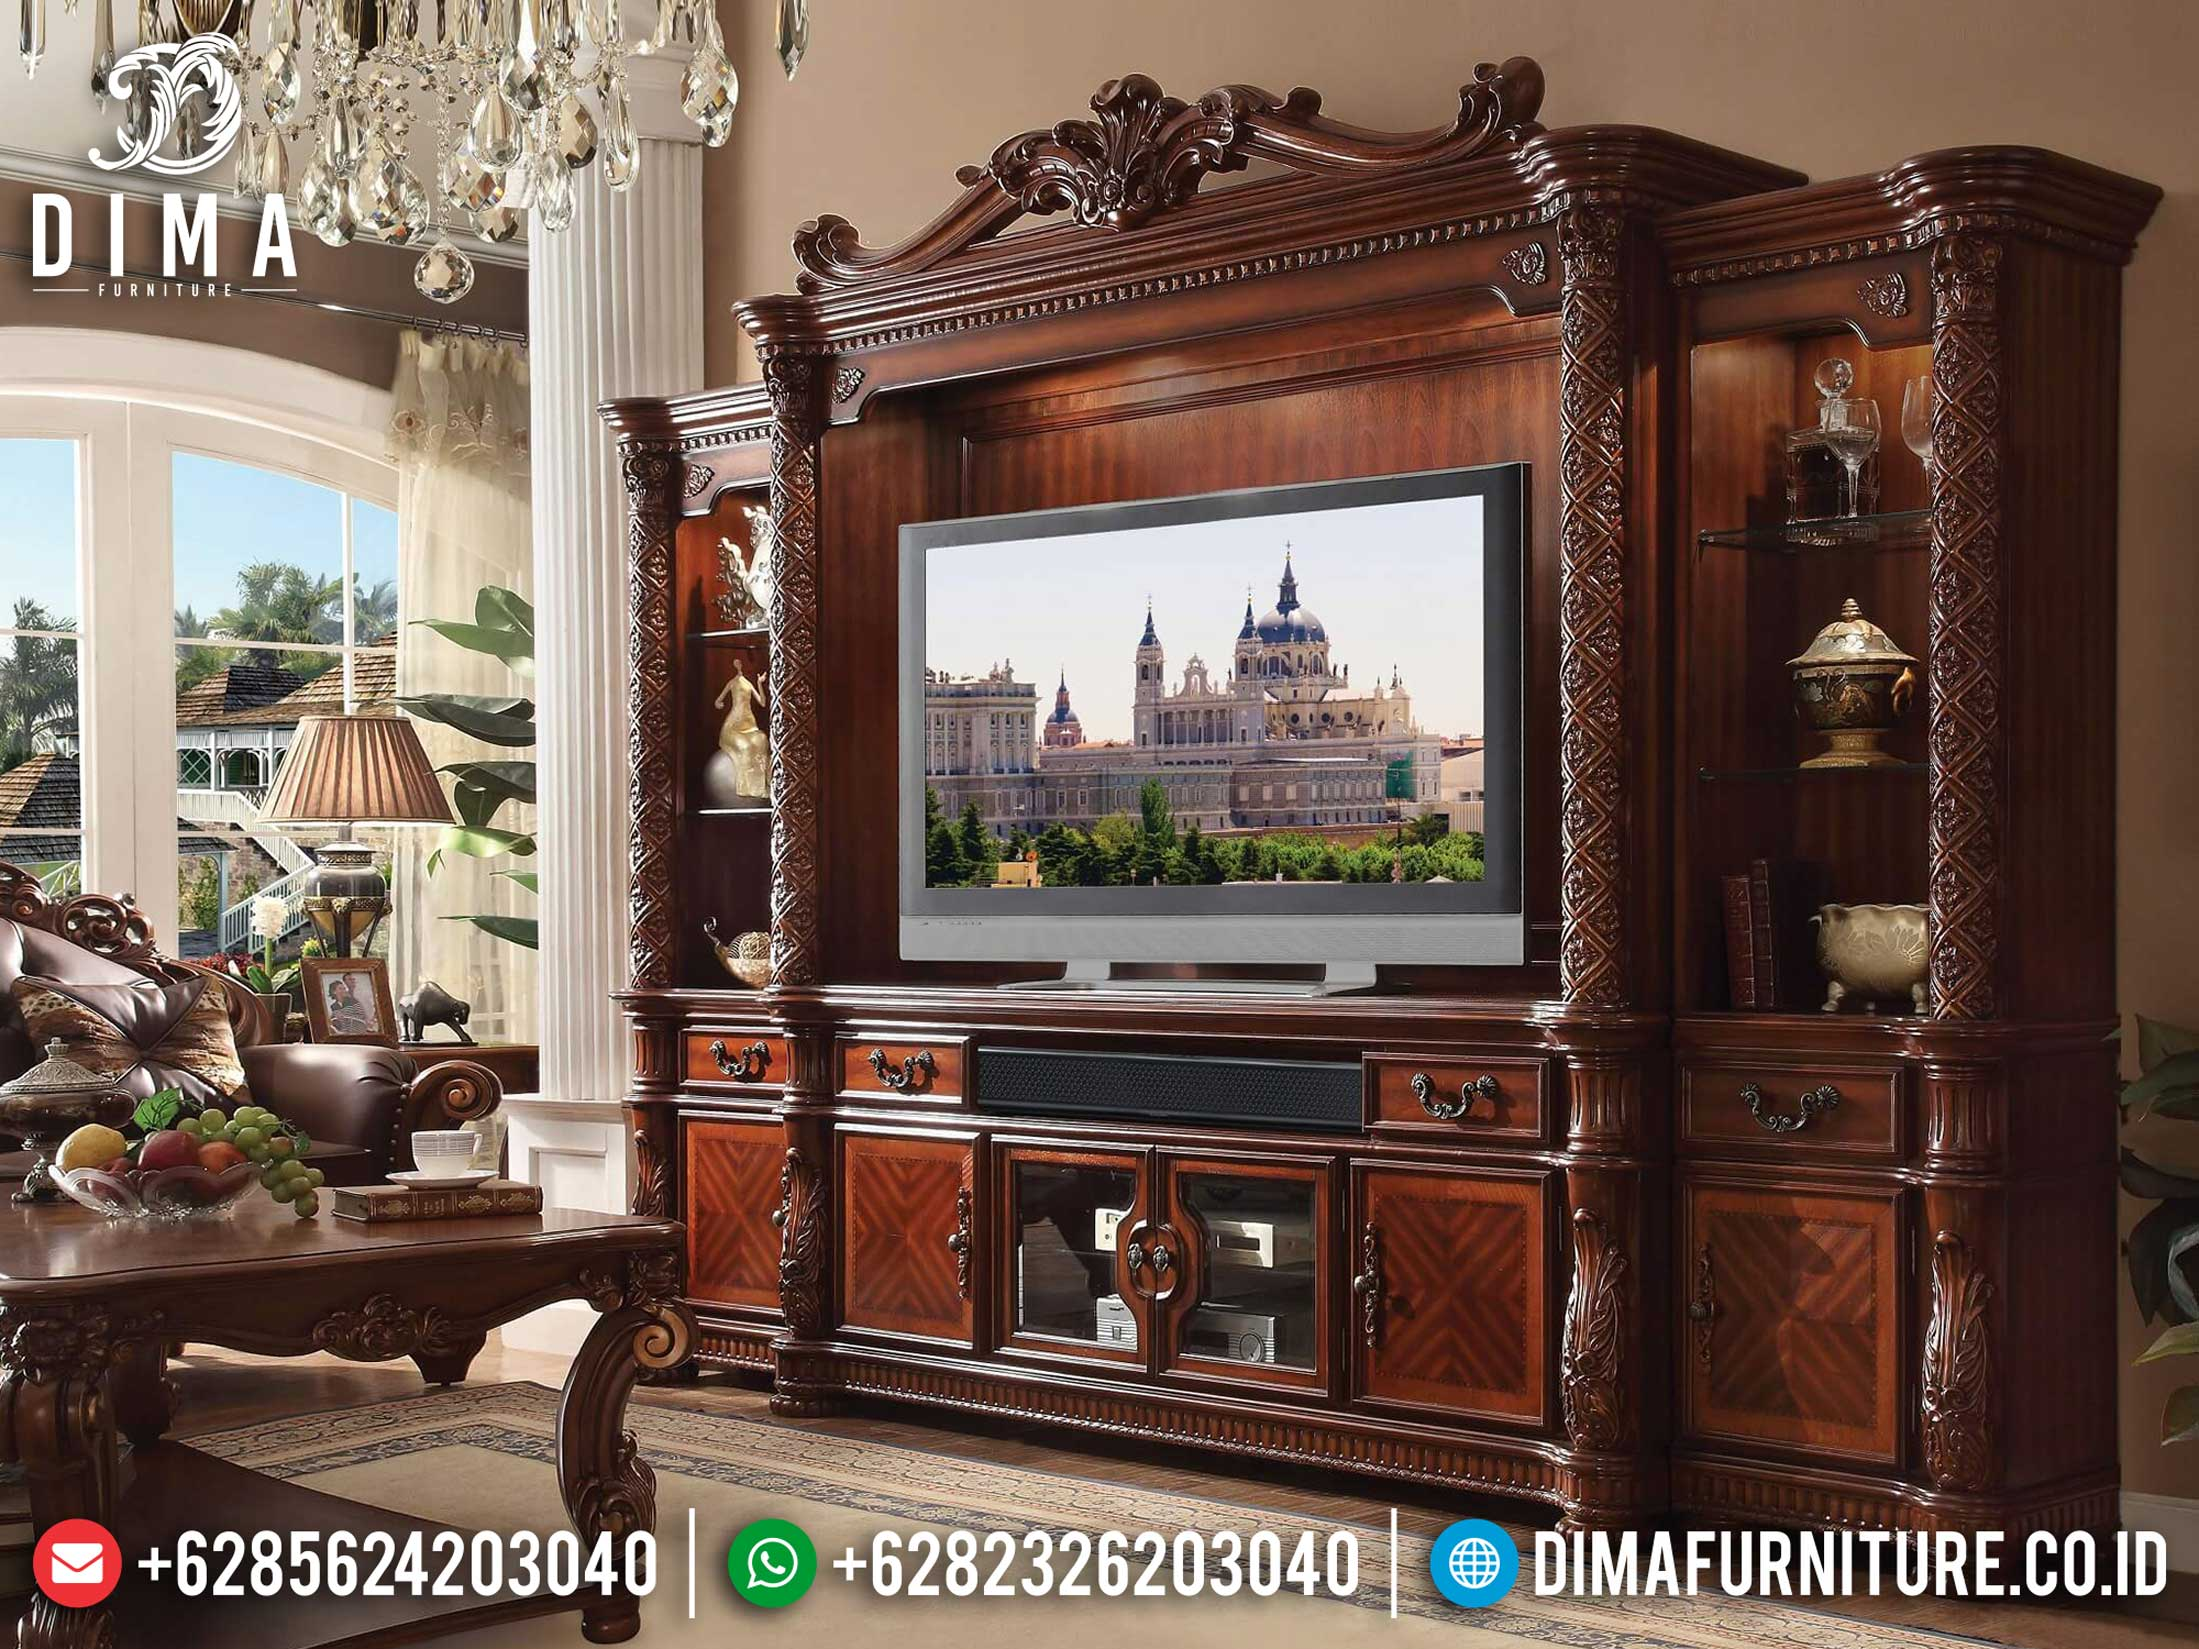 Model Bufet Tv Jati Set Lemari Hias Kaca Luxury Carving Jepara New 2020 TTJ-1030